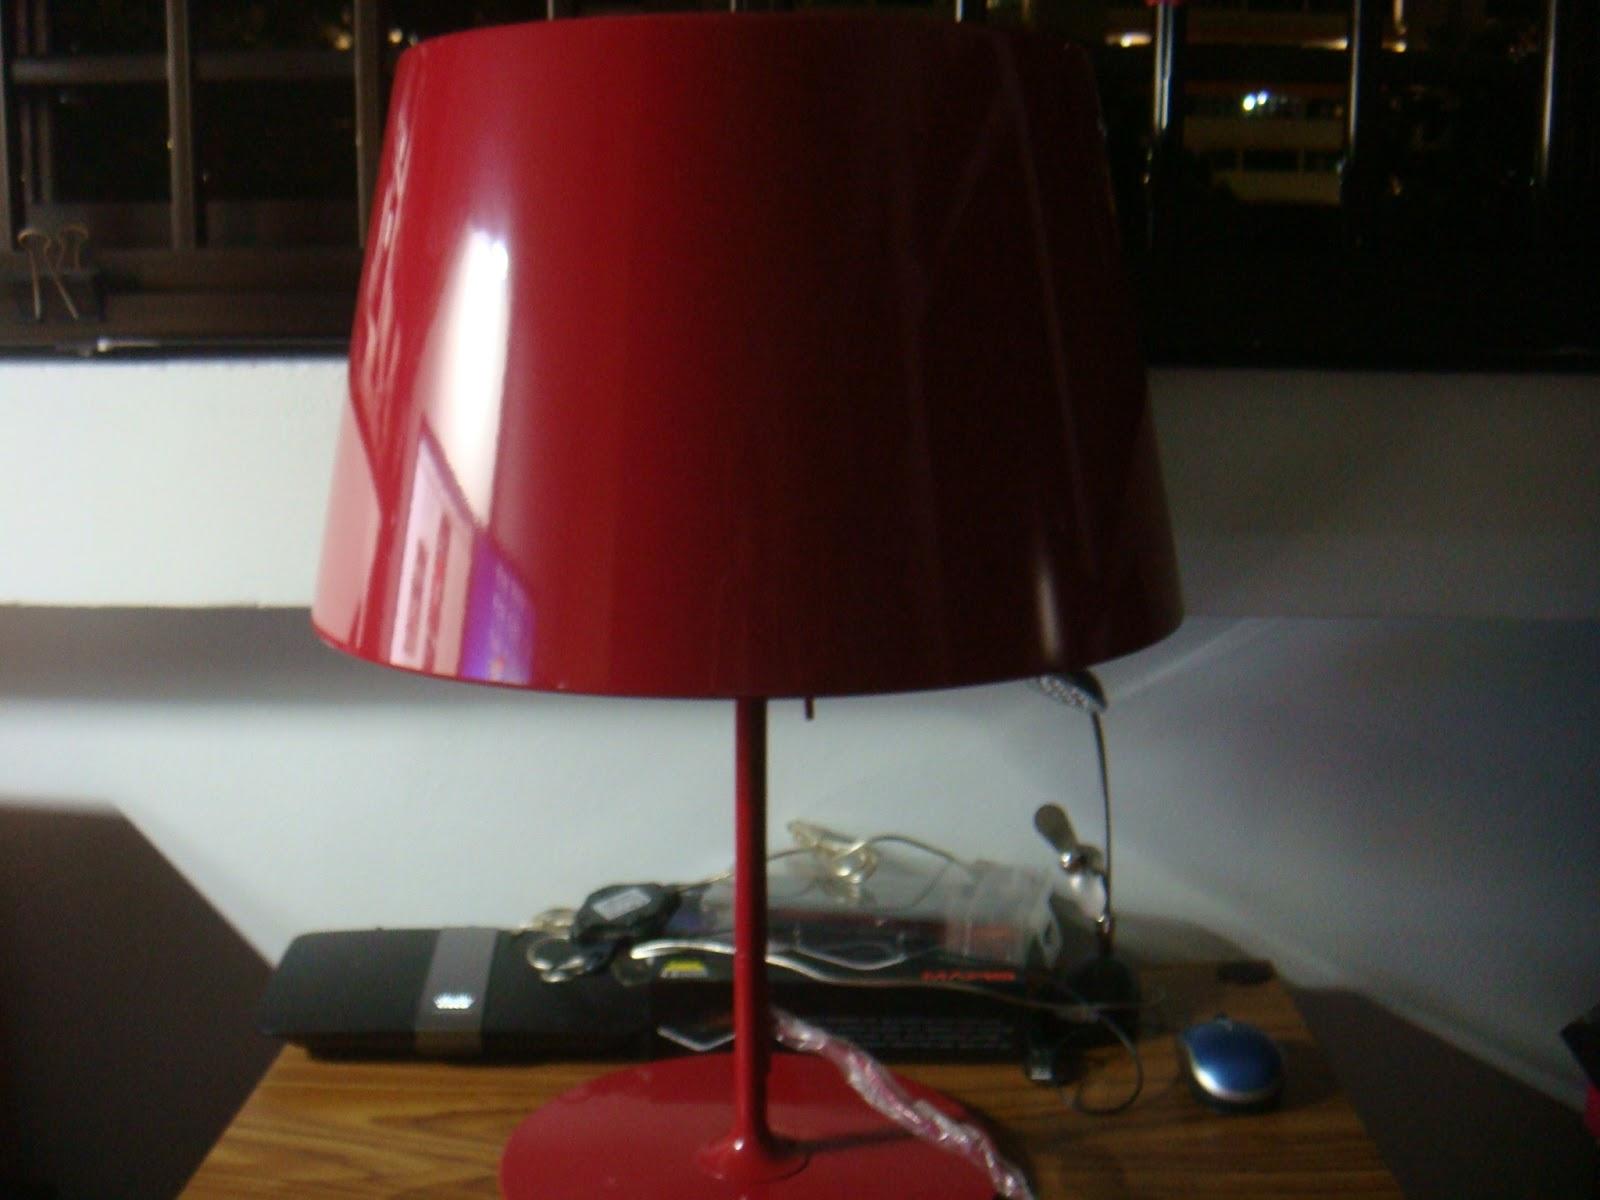 Ikea Kulla Lamp Dismantled